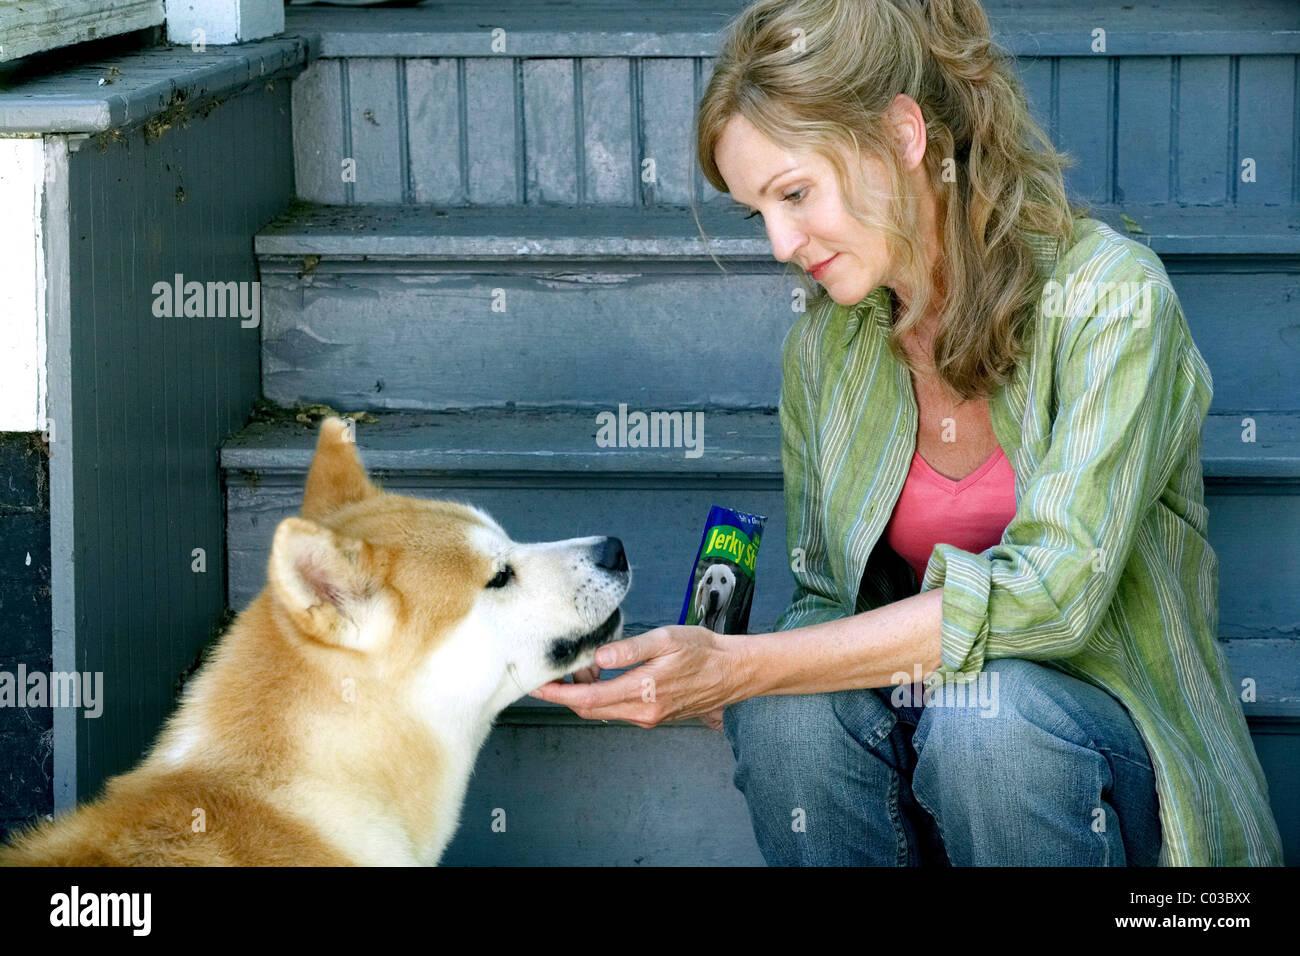 Hachiko movie summary. Hachi: A Dog's Tale (2009). 2019-02-06